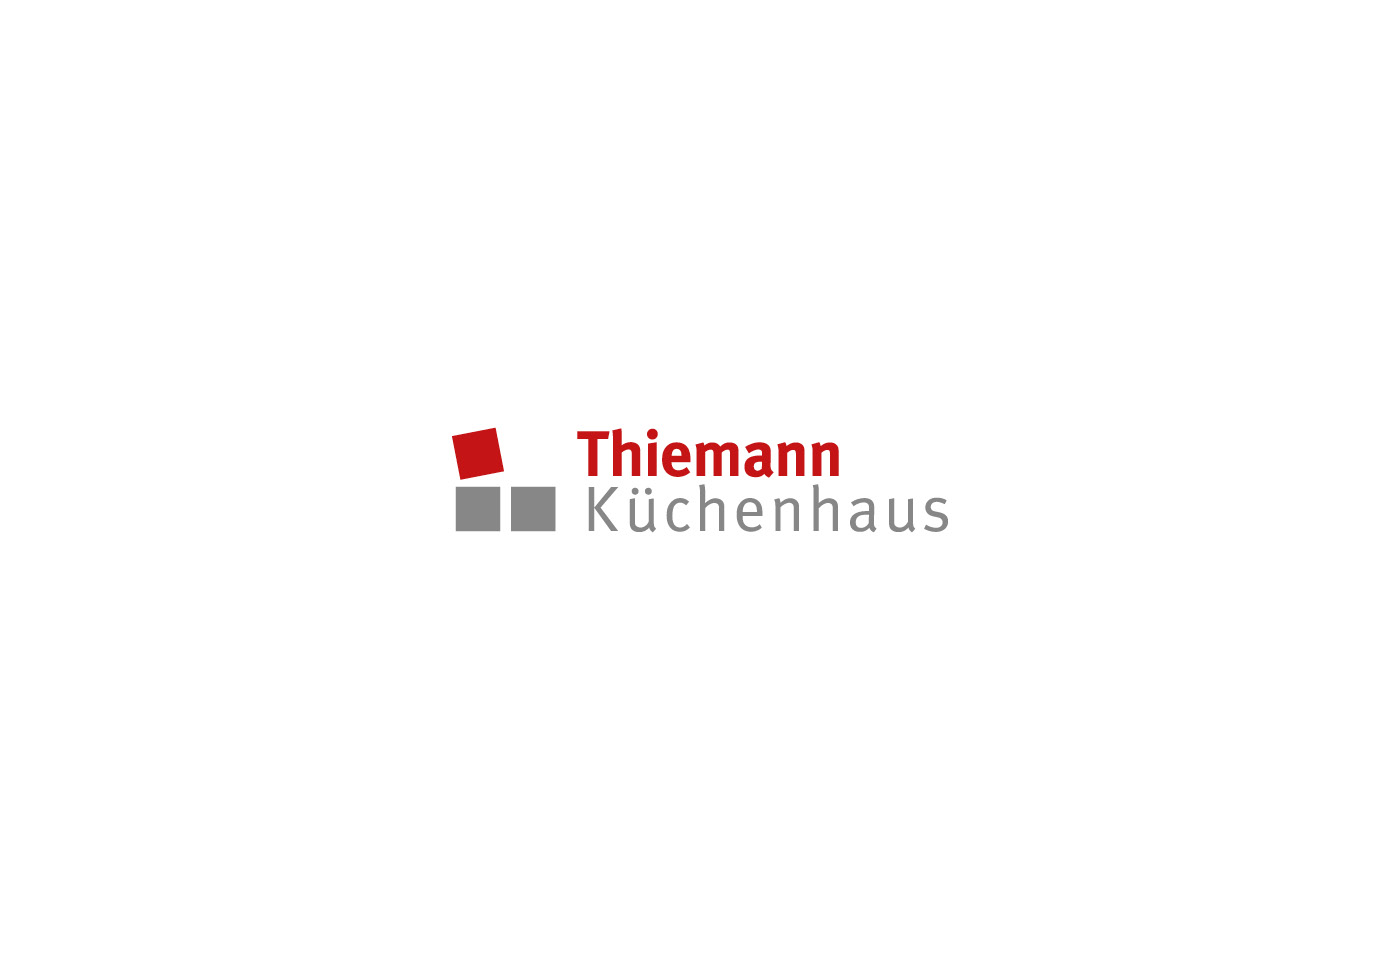 Küchenhaus  Küchenhaus Thiemann | THURM DESIGN